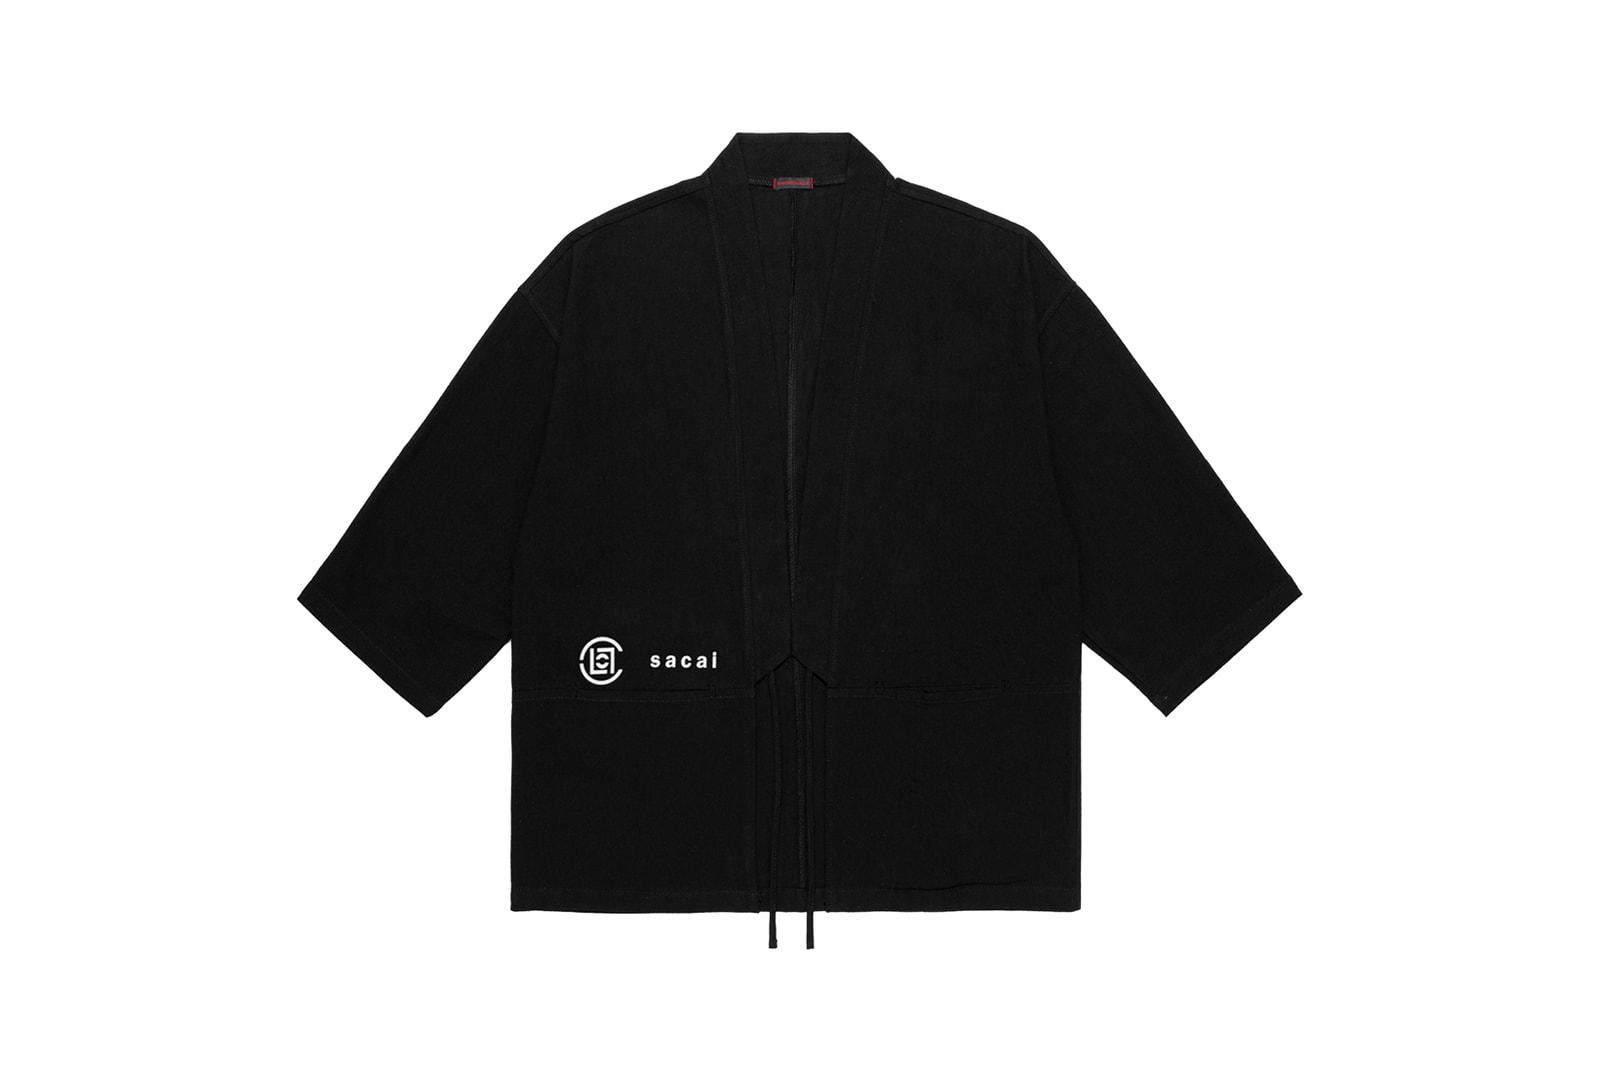 CLOT sacai CLOTsacaiTHEHOME Homeware Collaboration Pop Up Shop